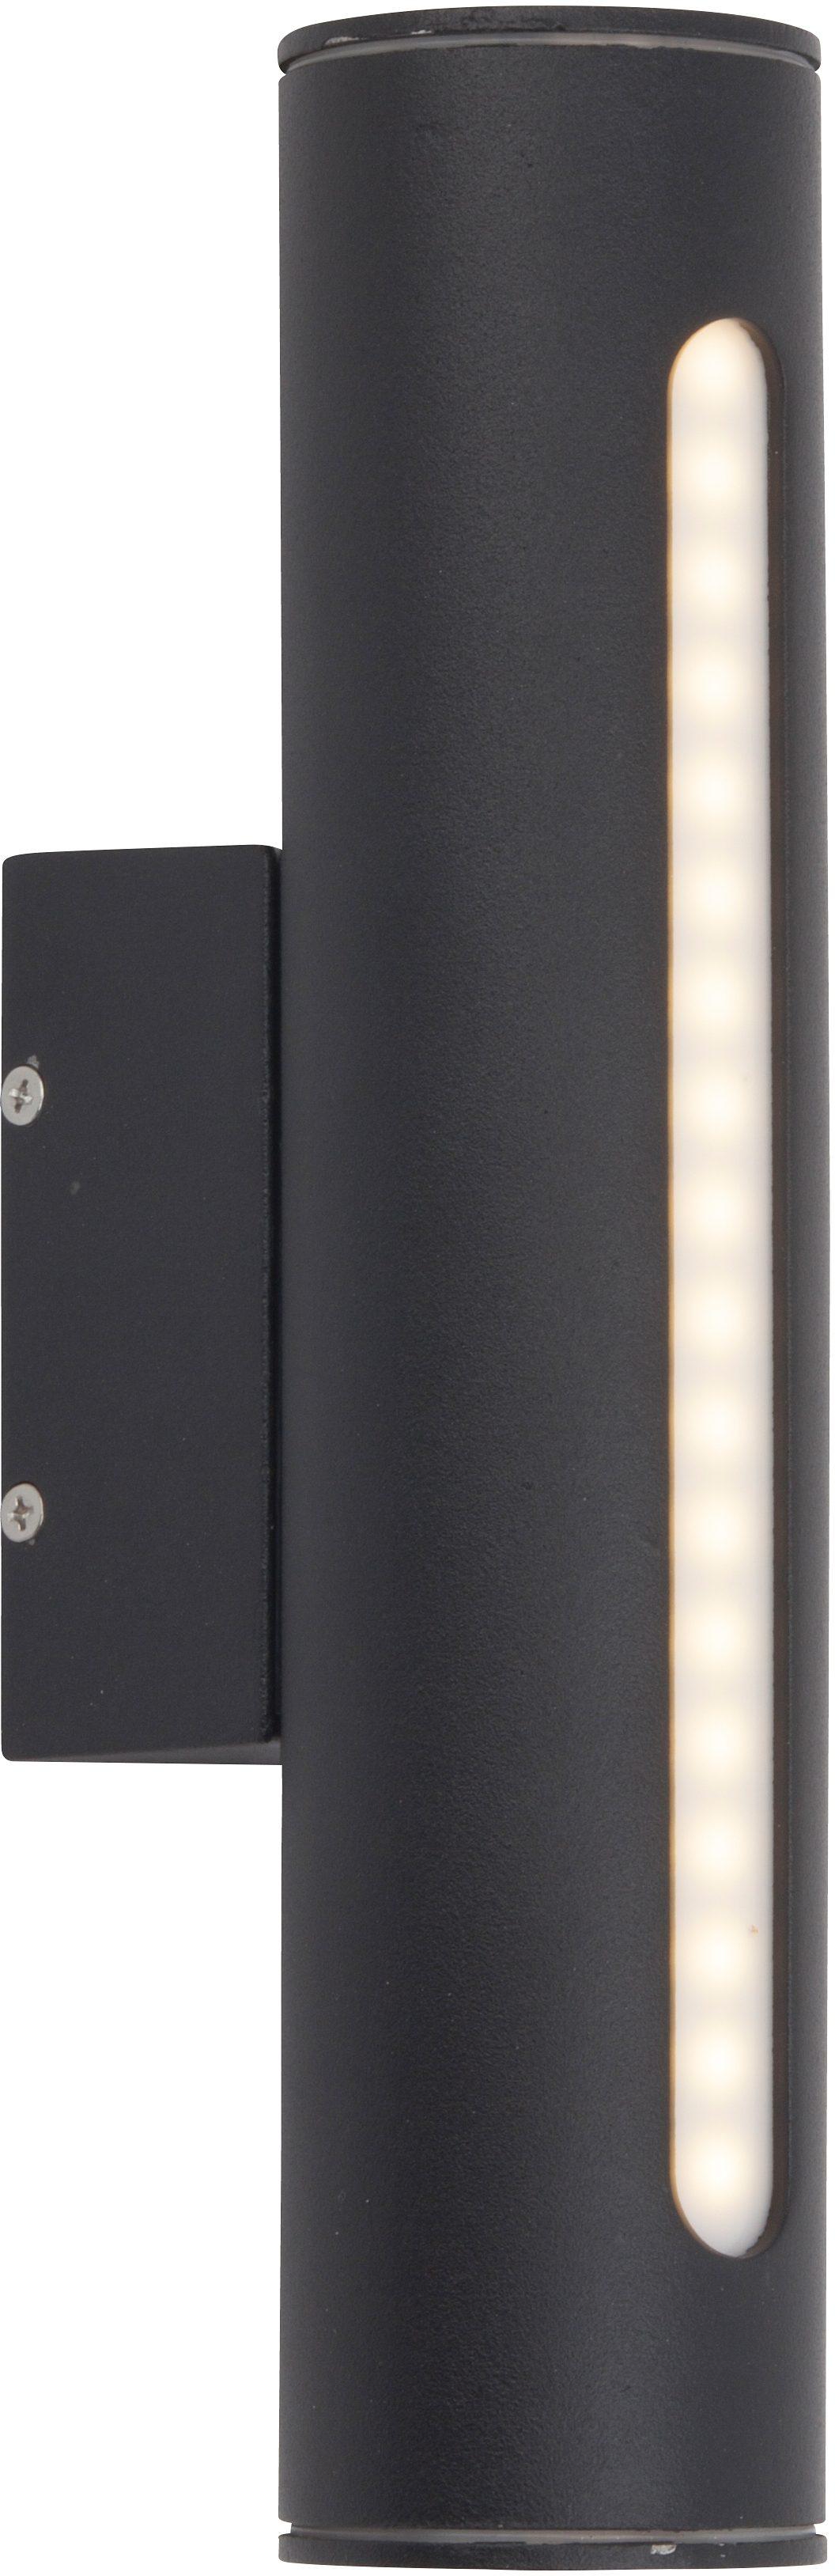 Brilliant LED Außenleuchte, 1 flg., Wandleuchte, »TWIN«